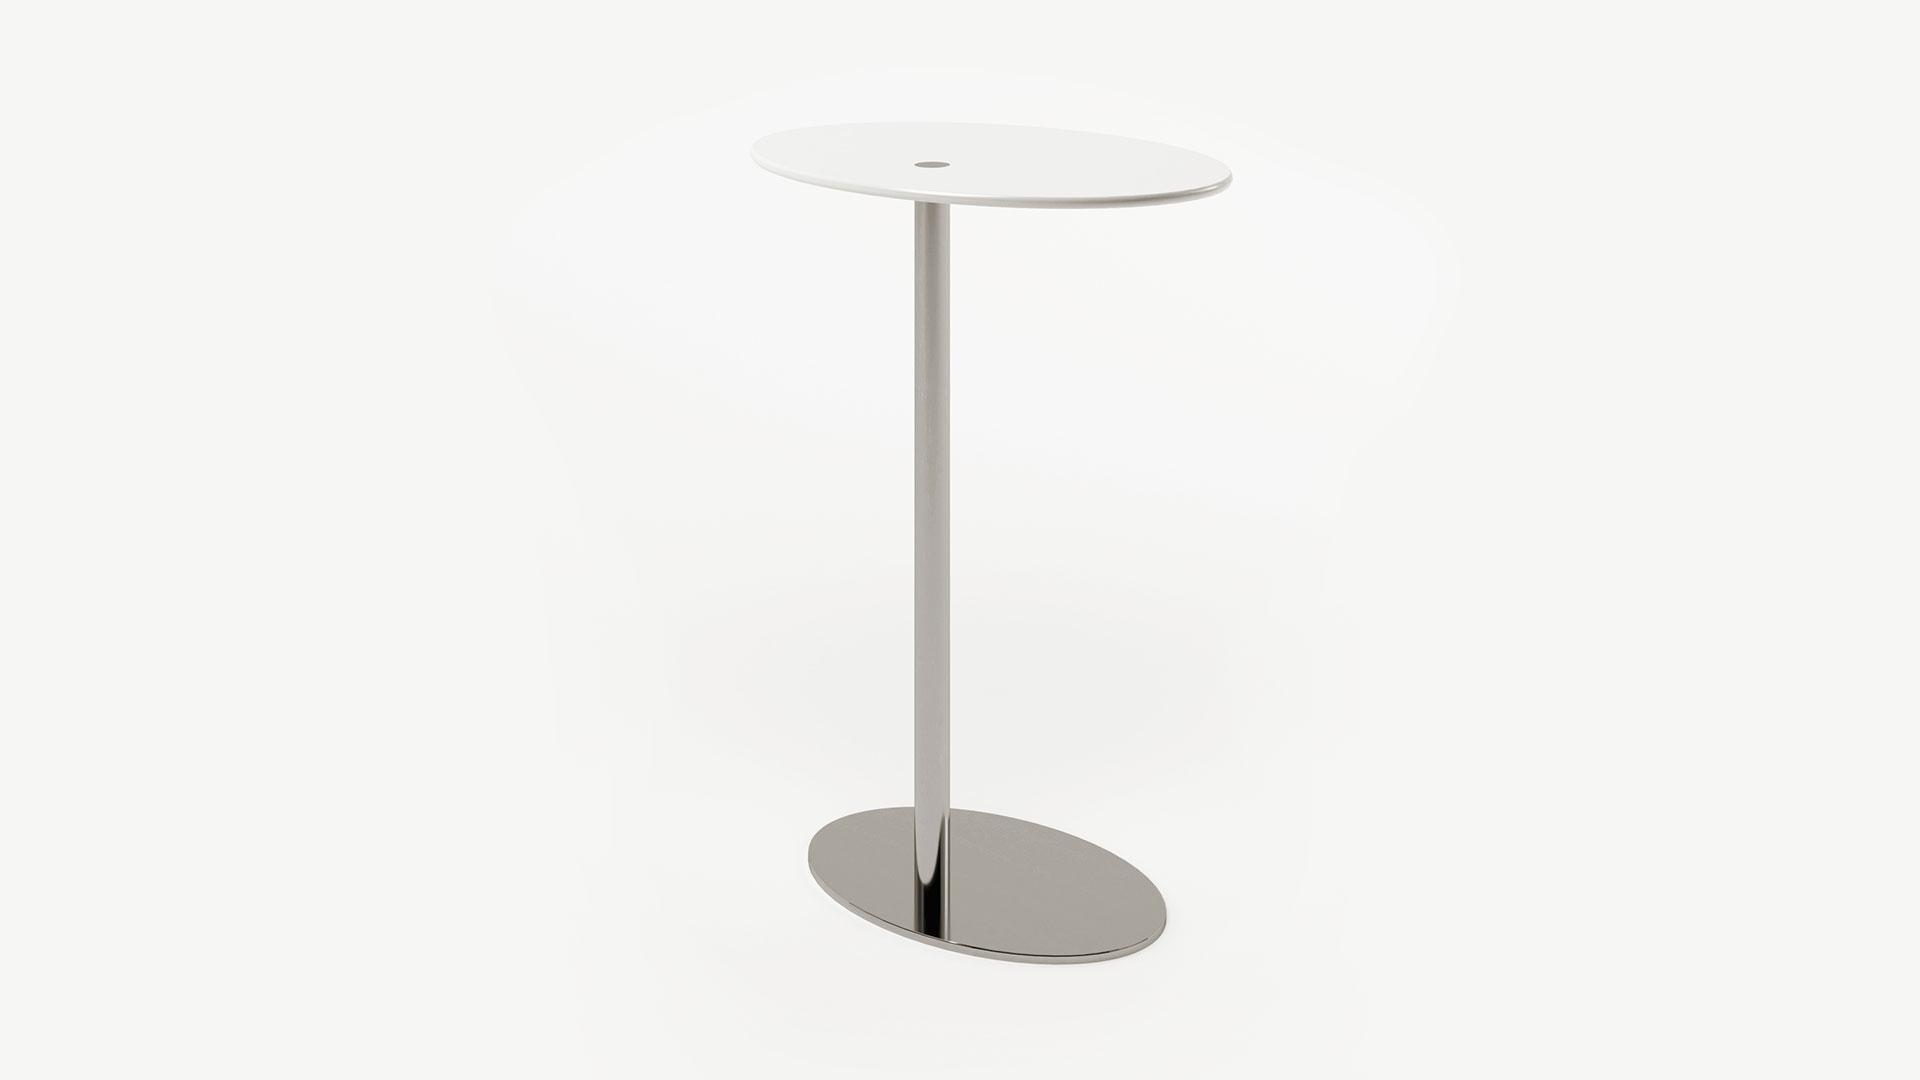 Dauphin_quadratischer_Tisch_transparent_Atelier_1